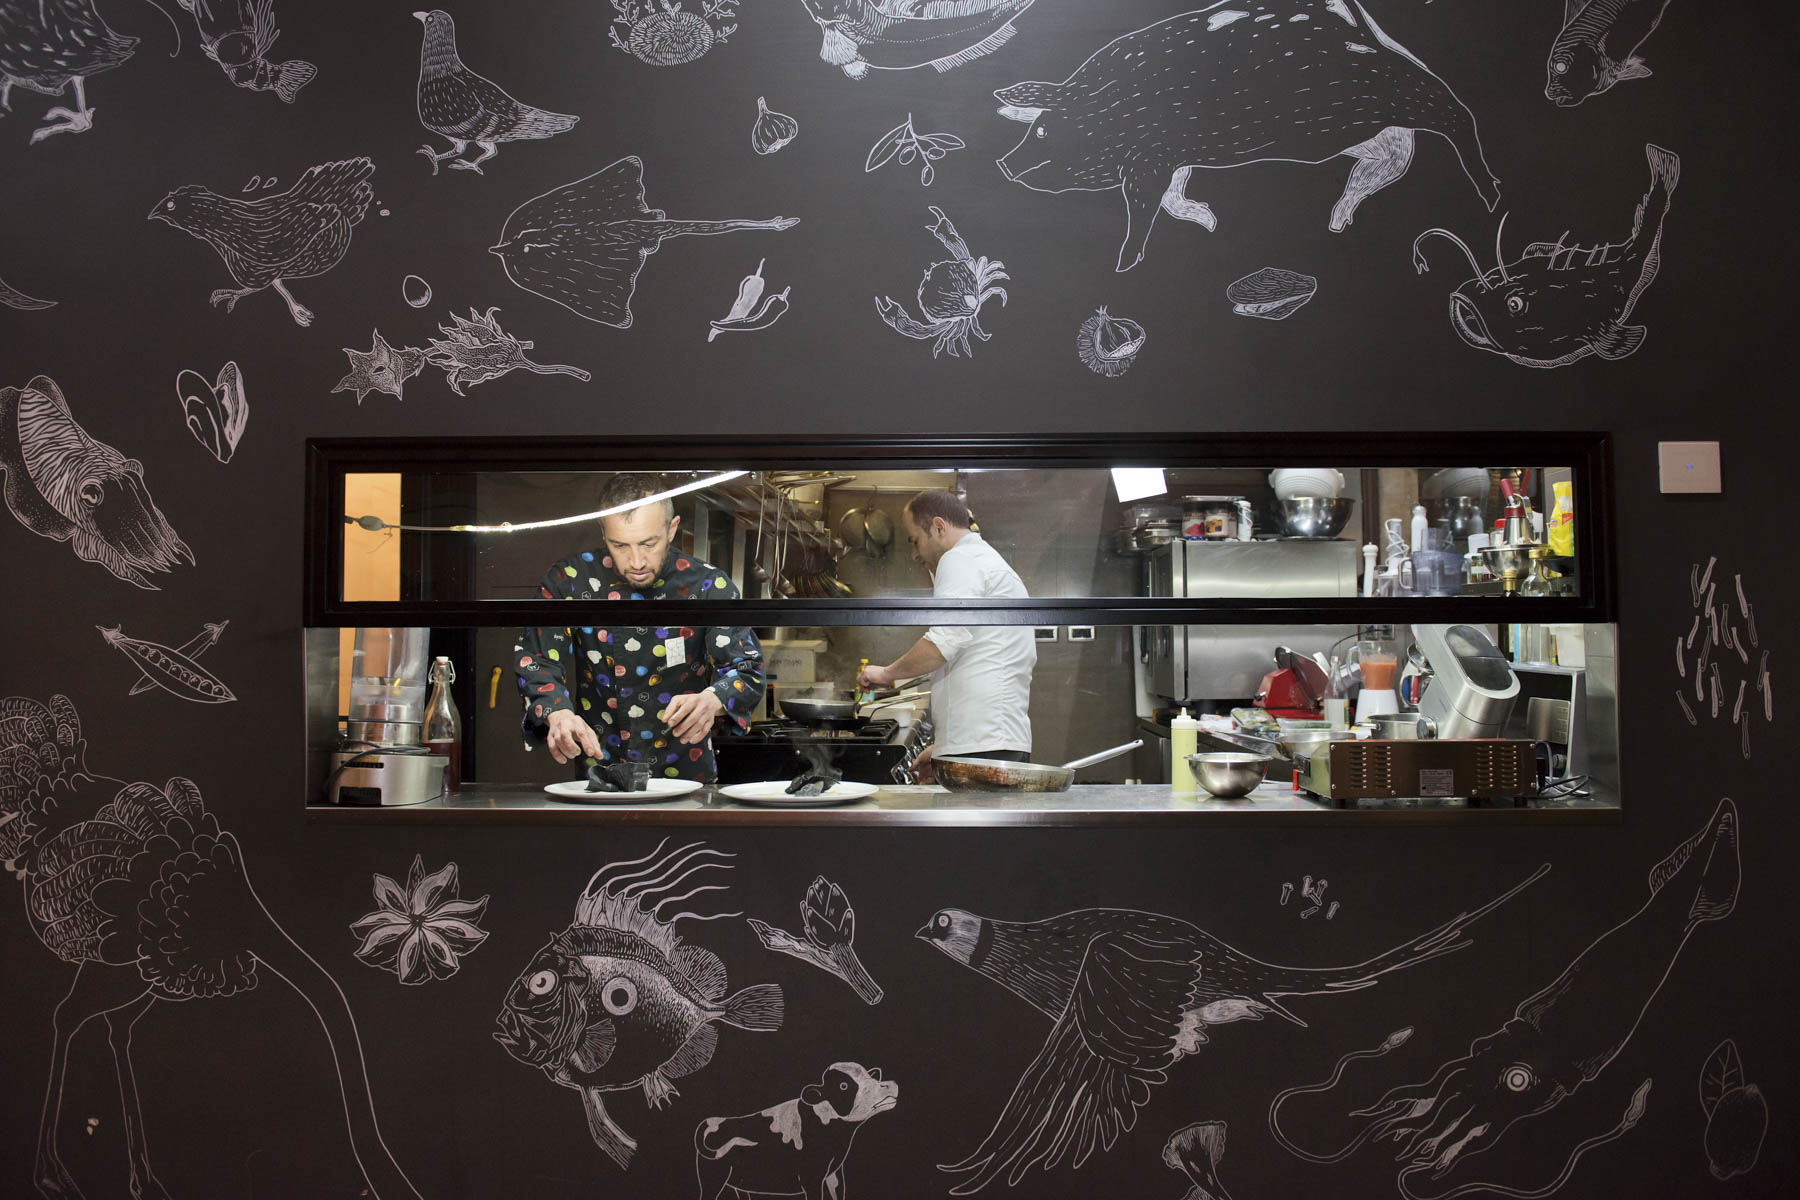 Chefs Valerio Chiacchierini, left, and Davide Lombardi in action in their semiopen kitchen.